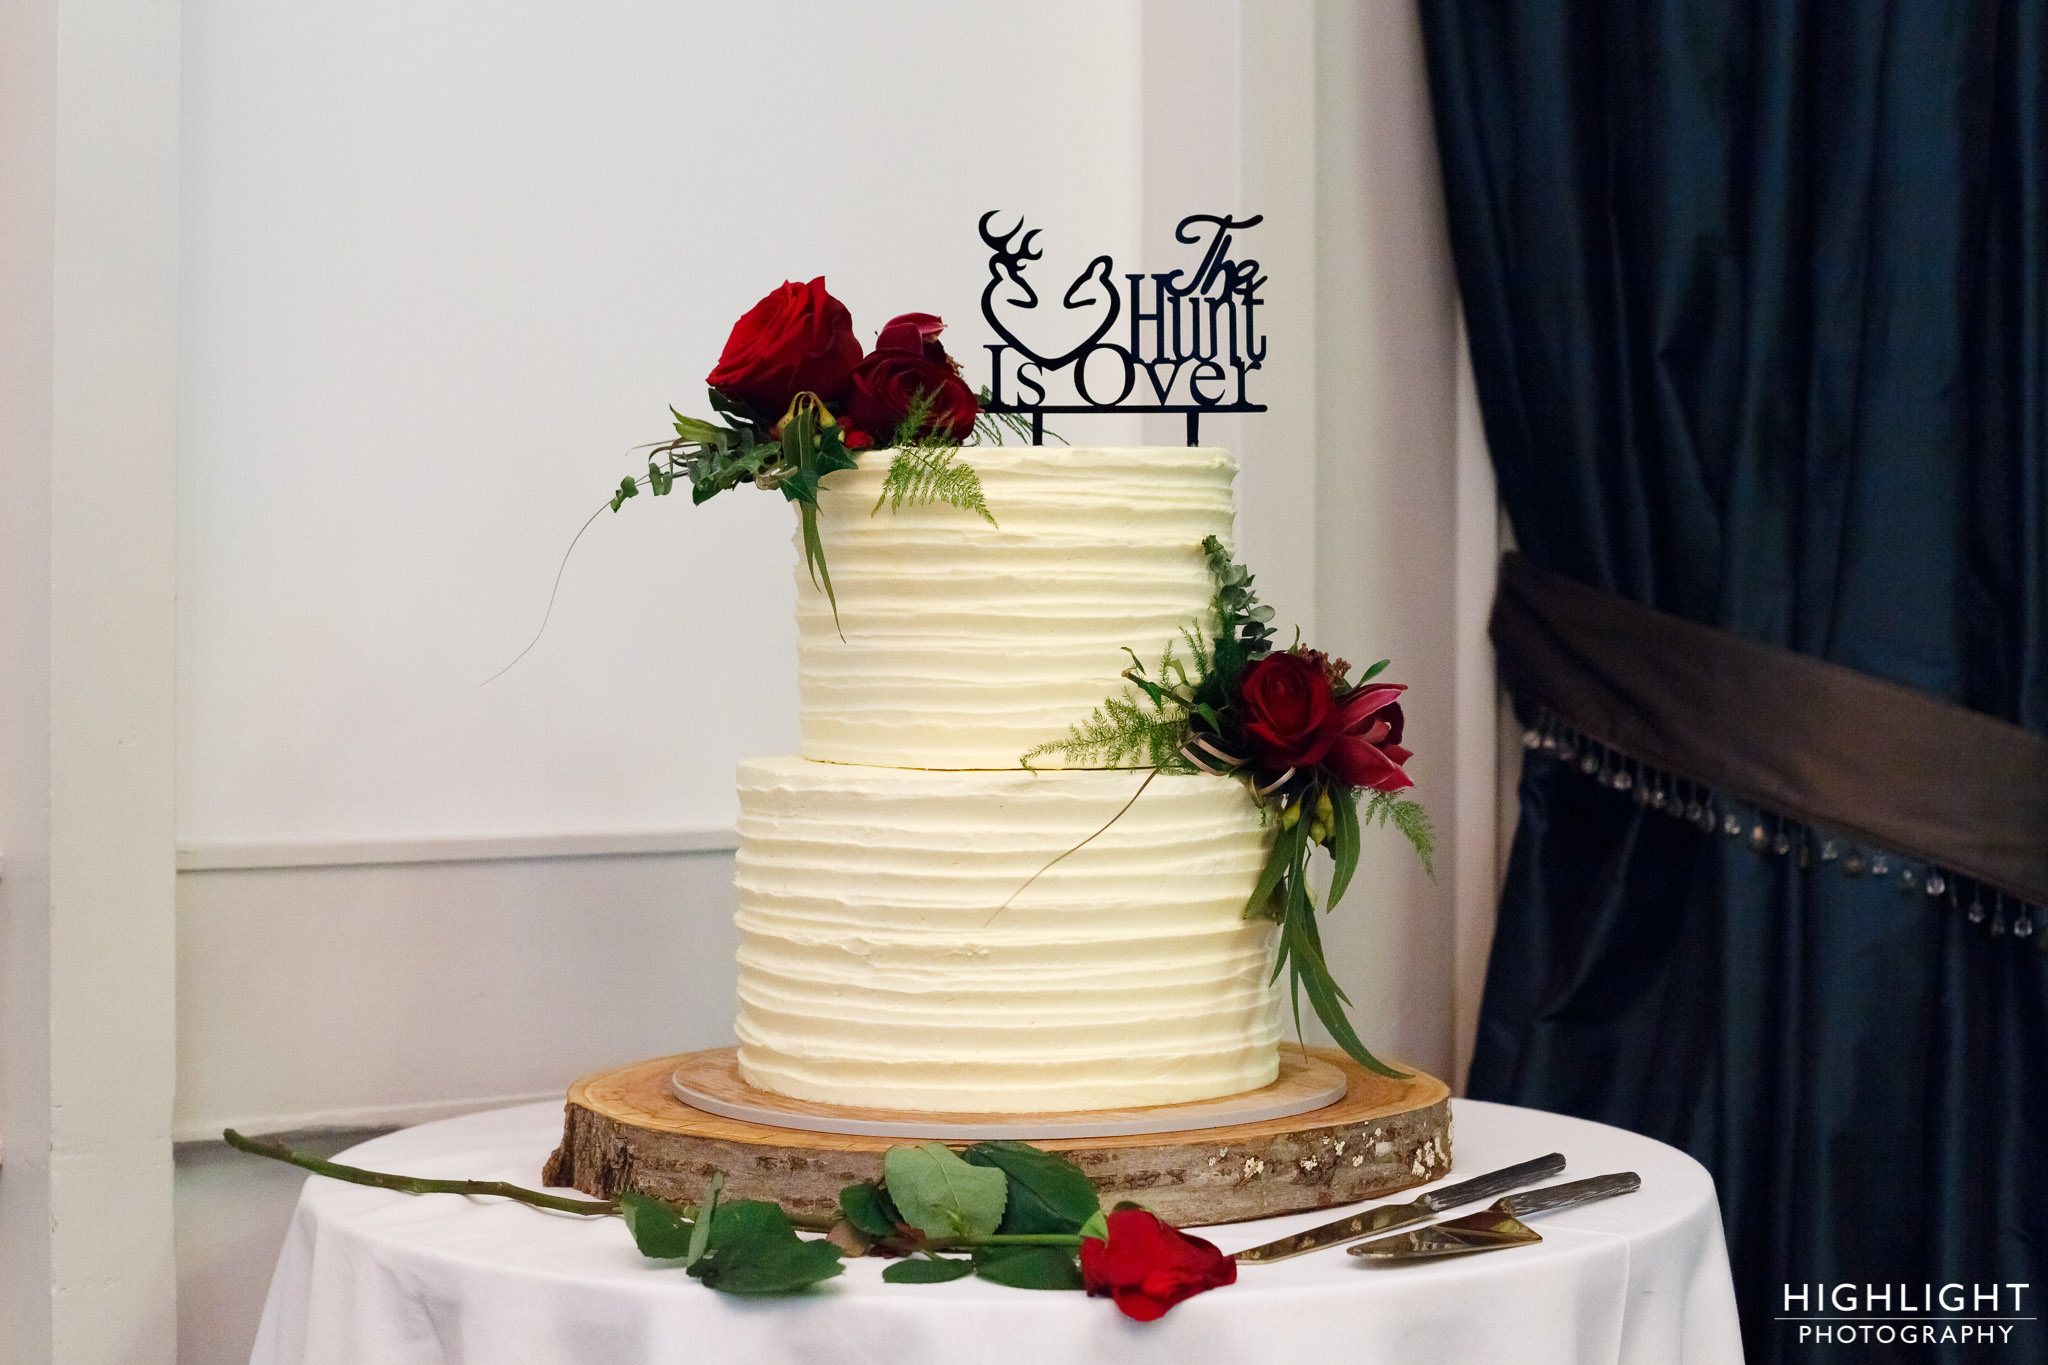 Highlight-wedding-photography-new-zealand-palmerston-north-119.jpg